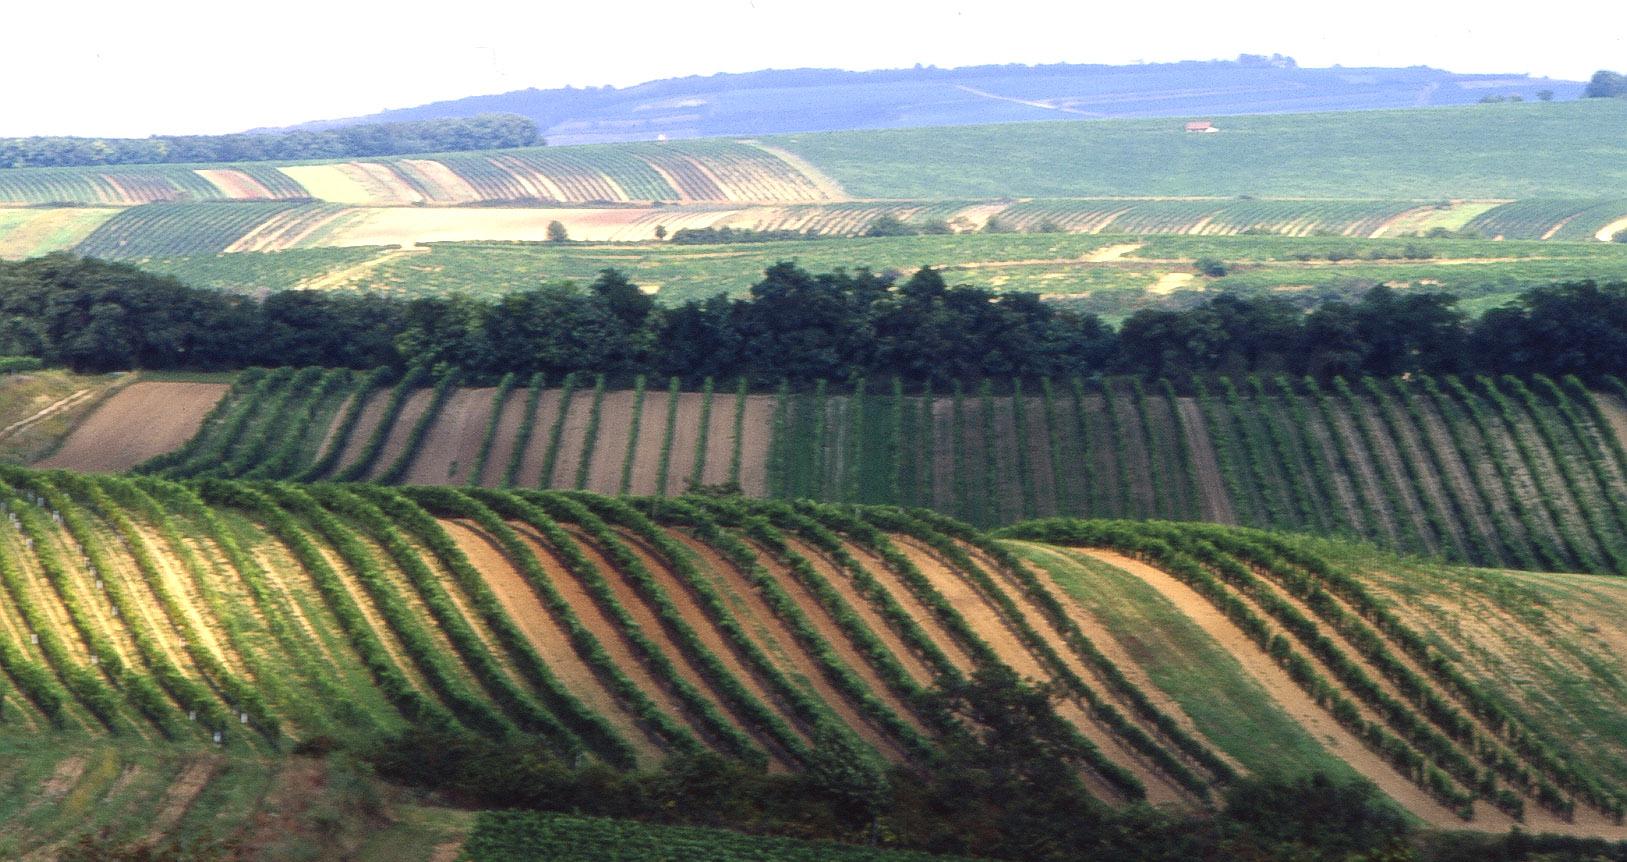 Herrnbaumgarten - vineyards